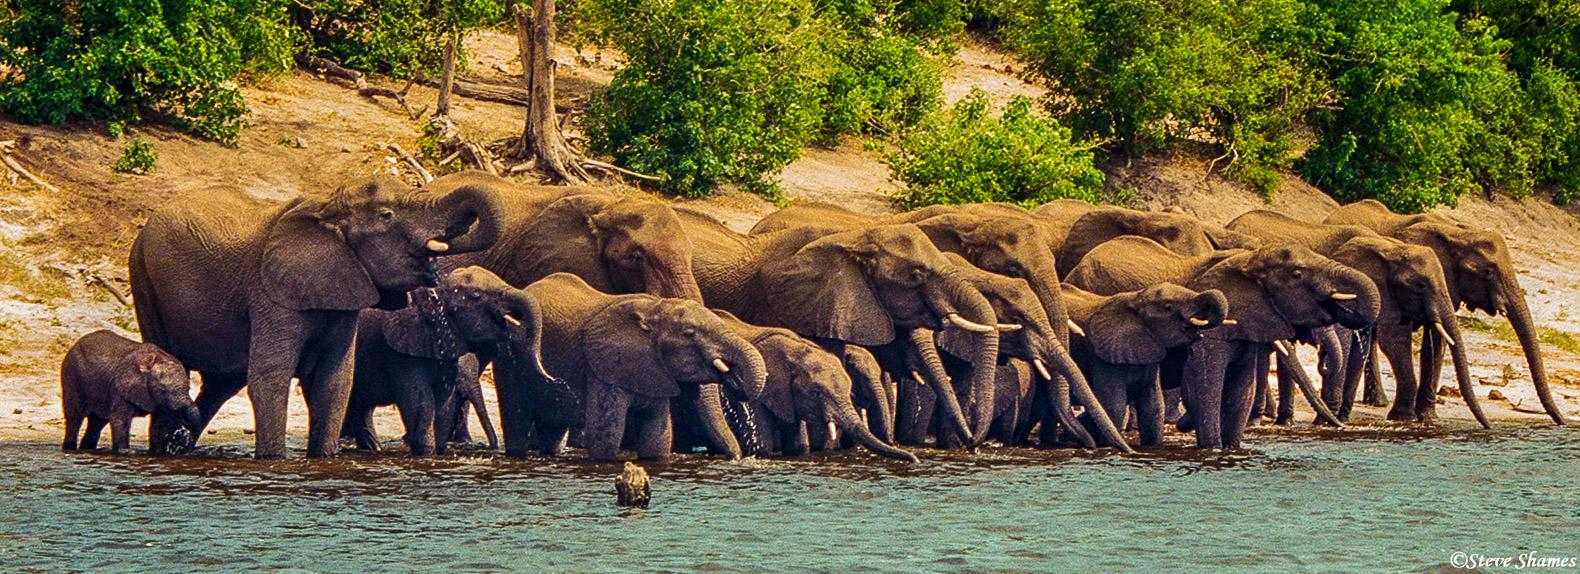 chobe national park, chobe river, thirsty elephants, photo